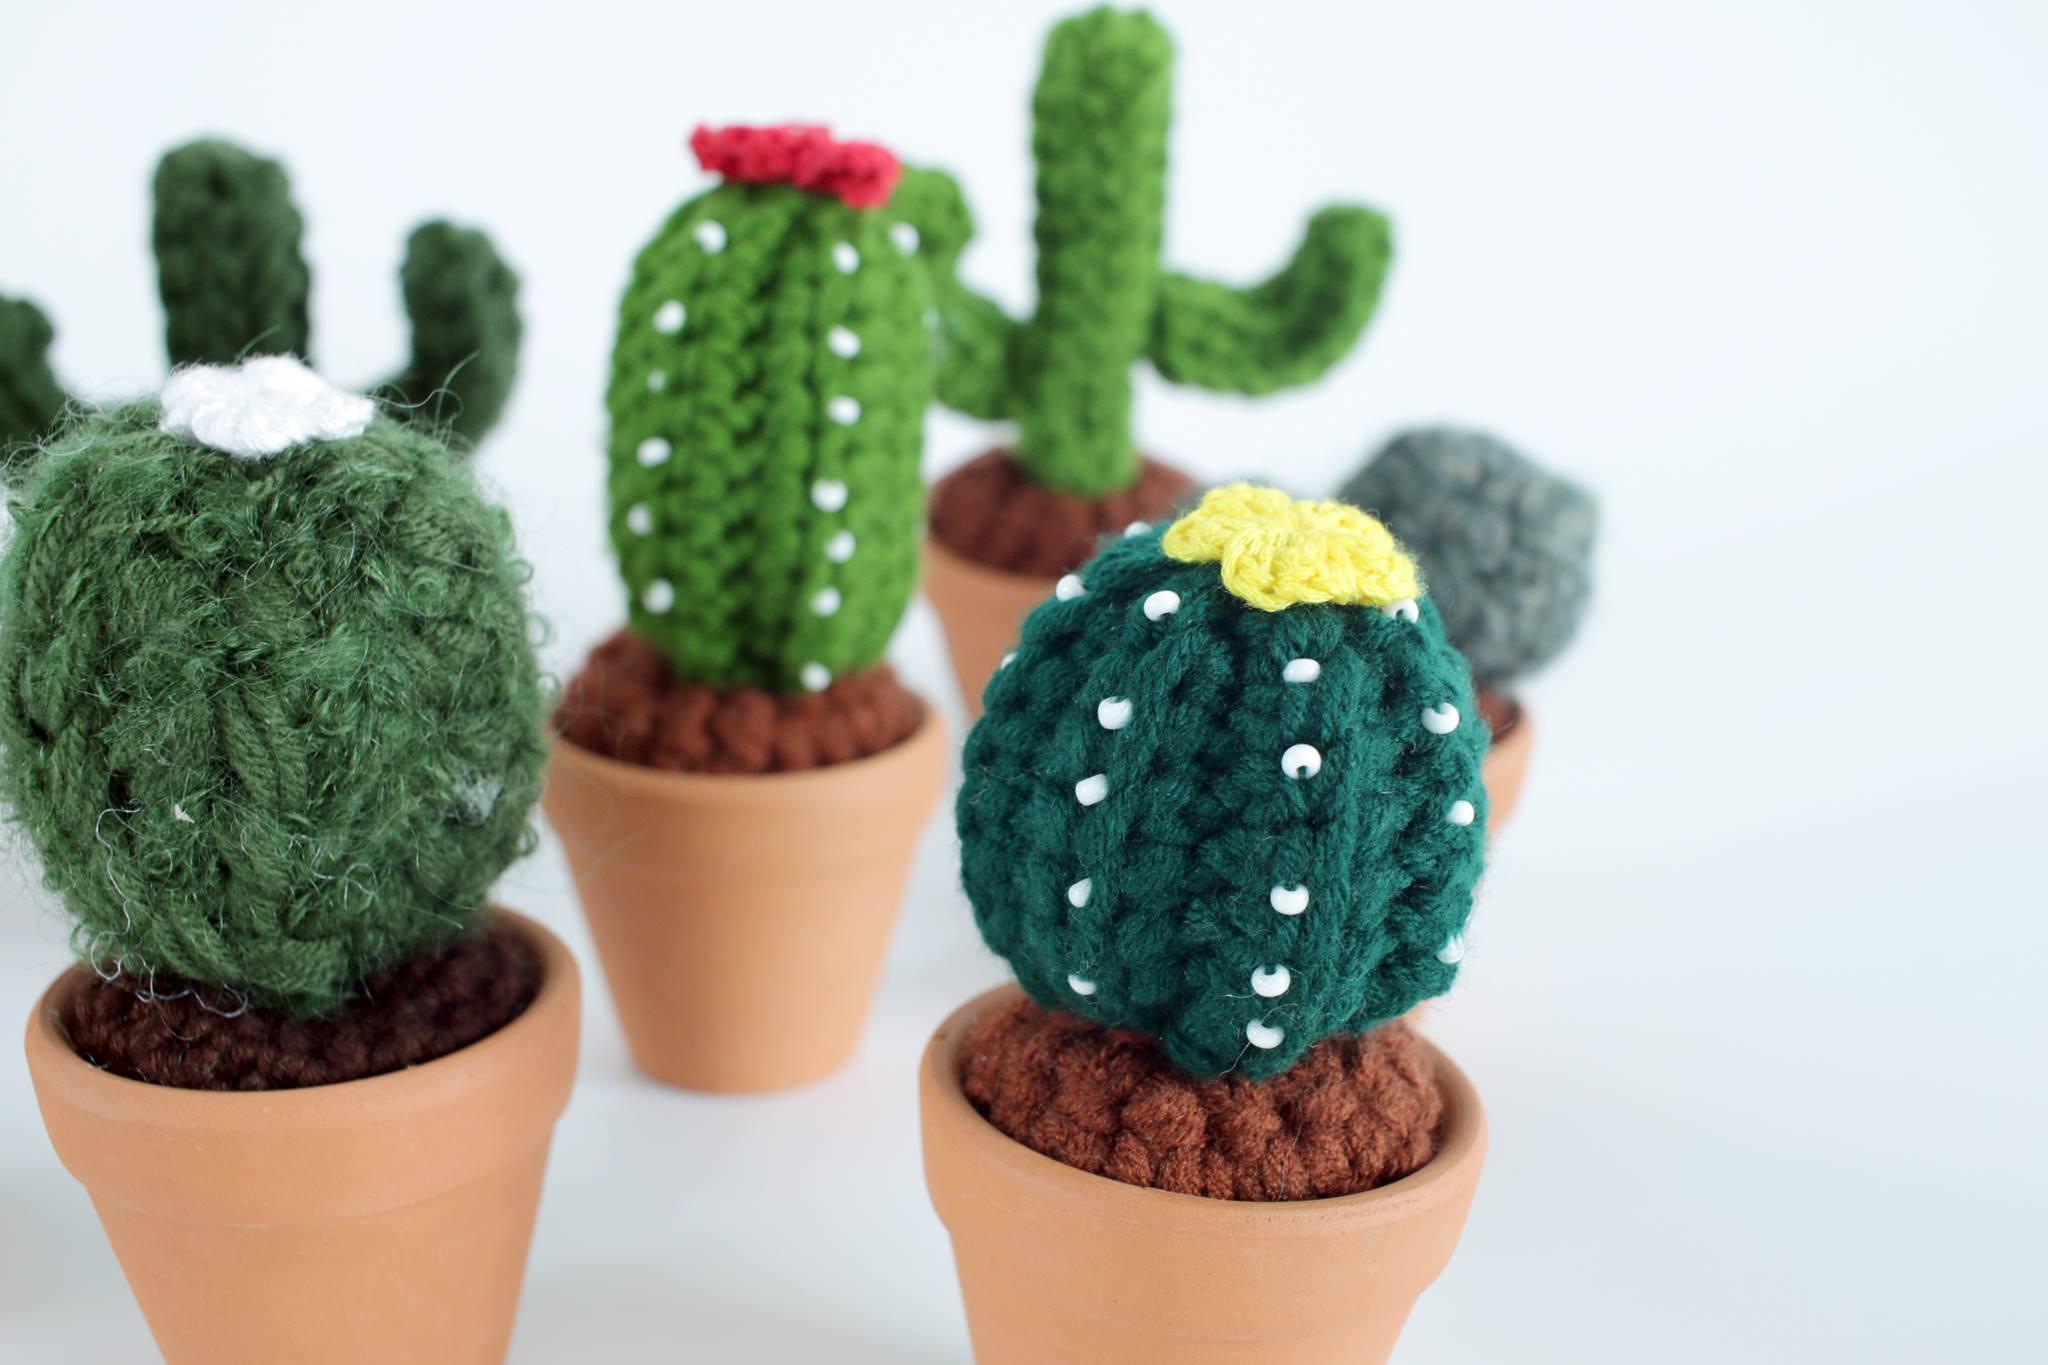 Crochet Cactus Workshop